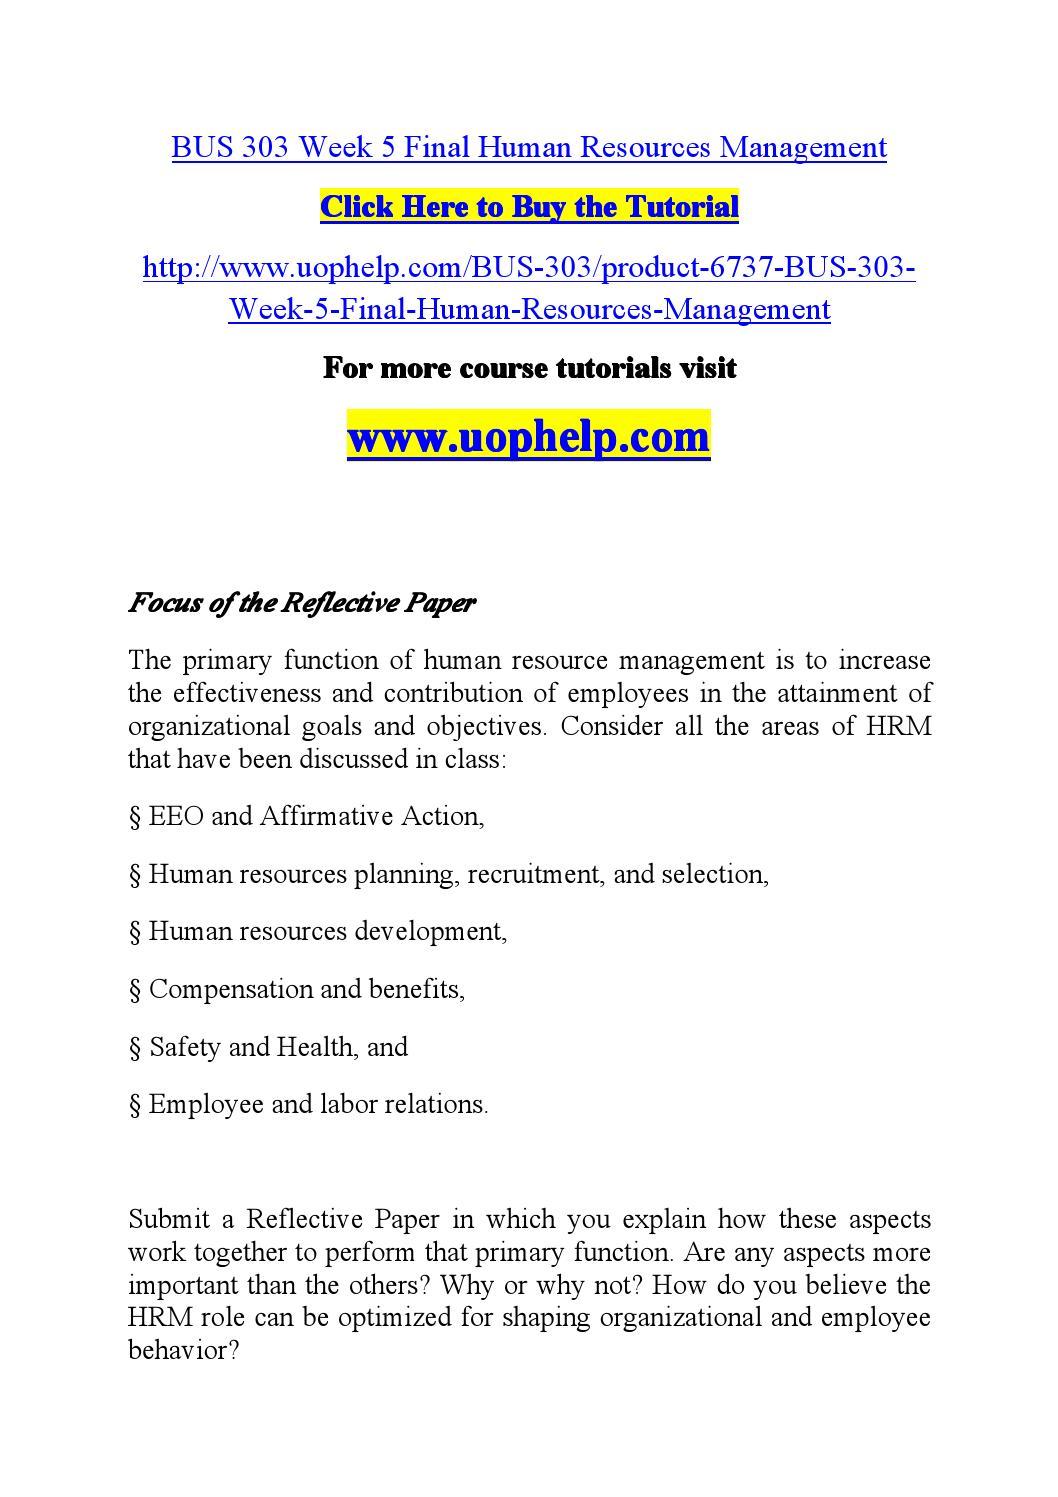 Bus303: Human Resources Management Final Paper Paper